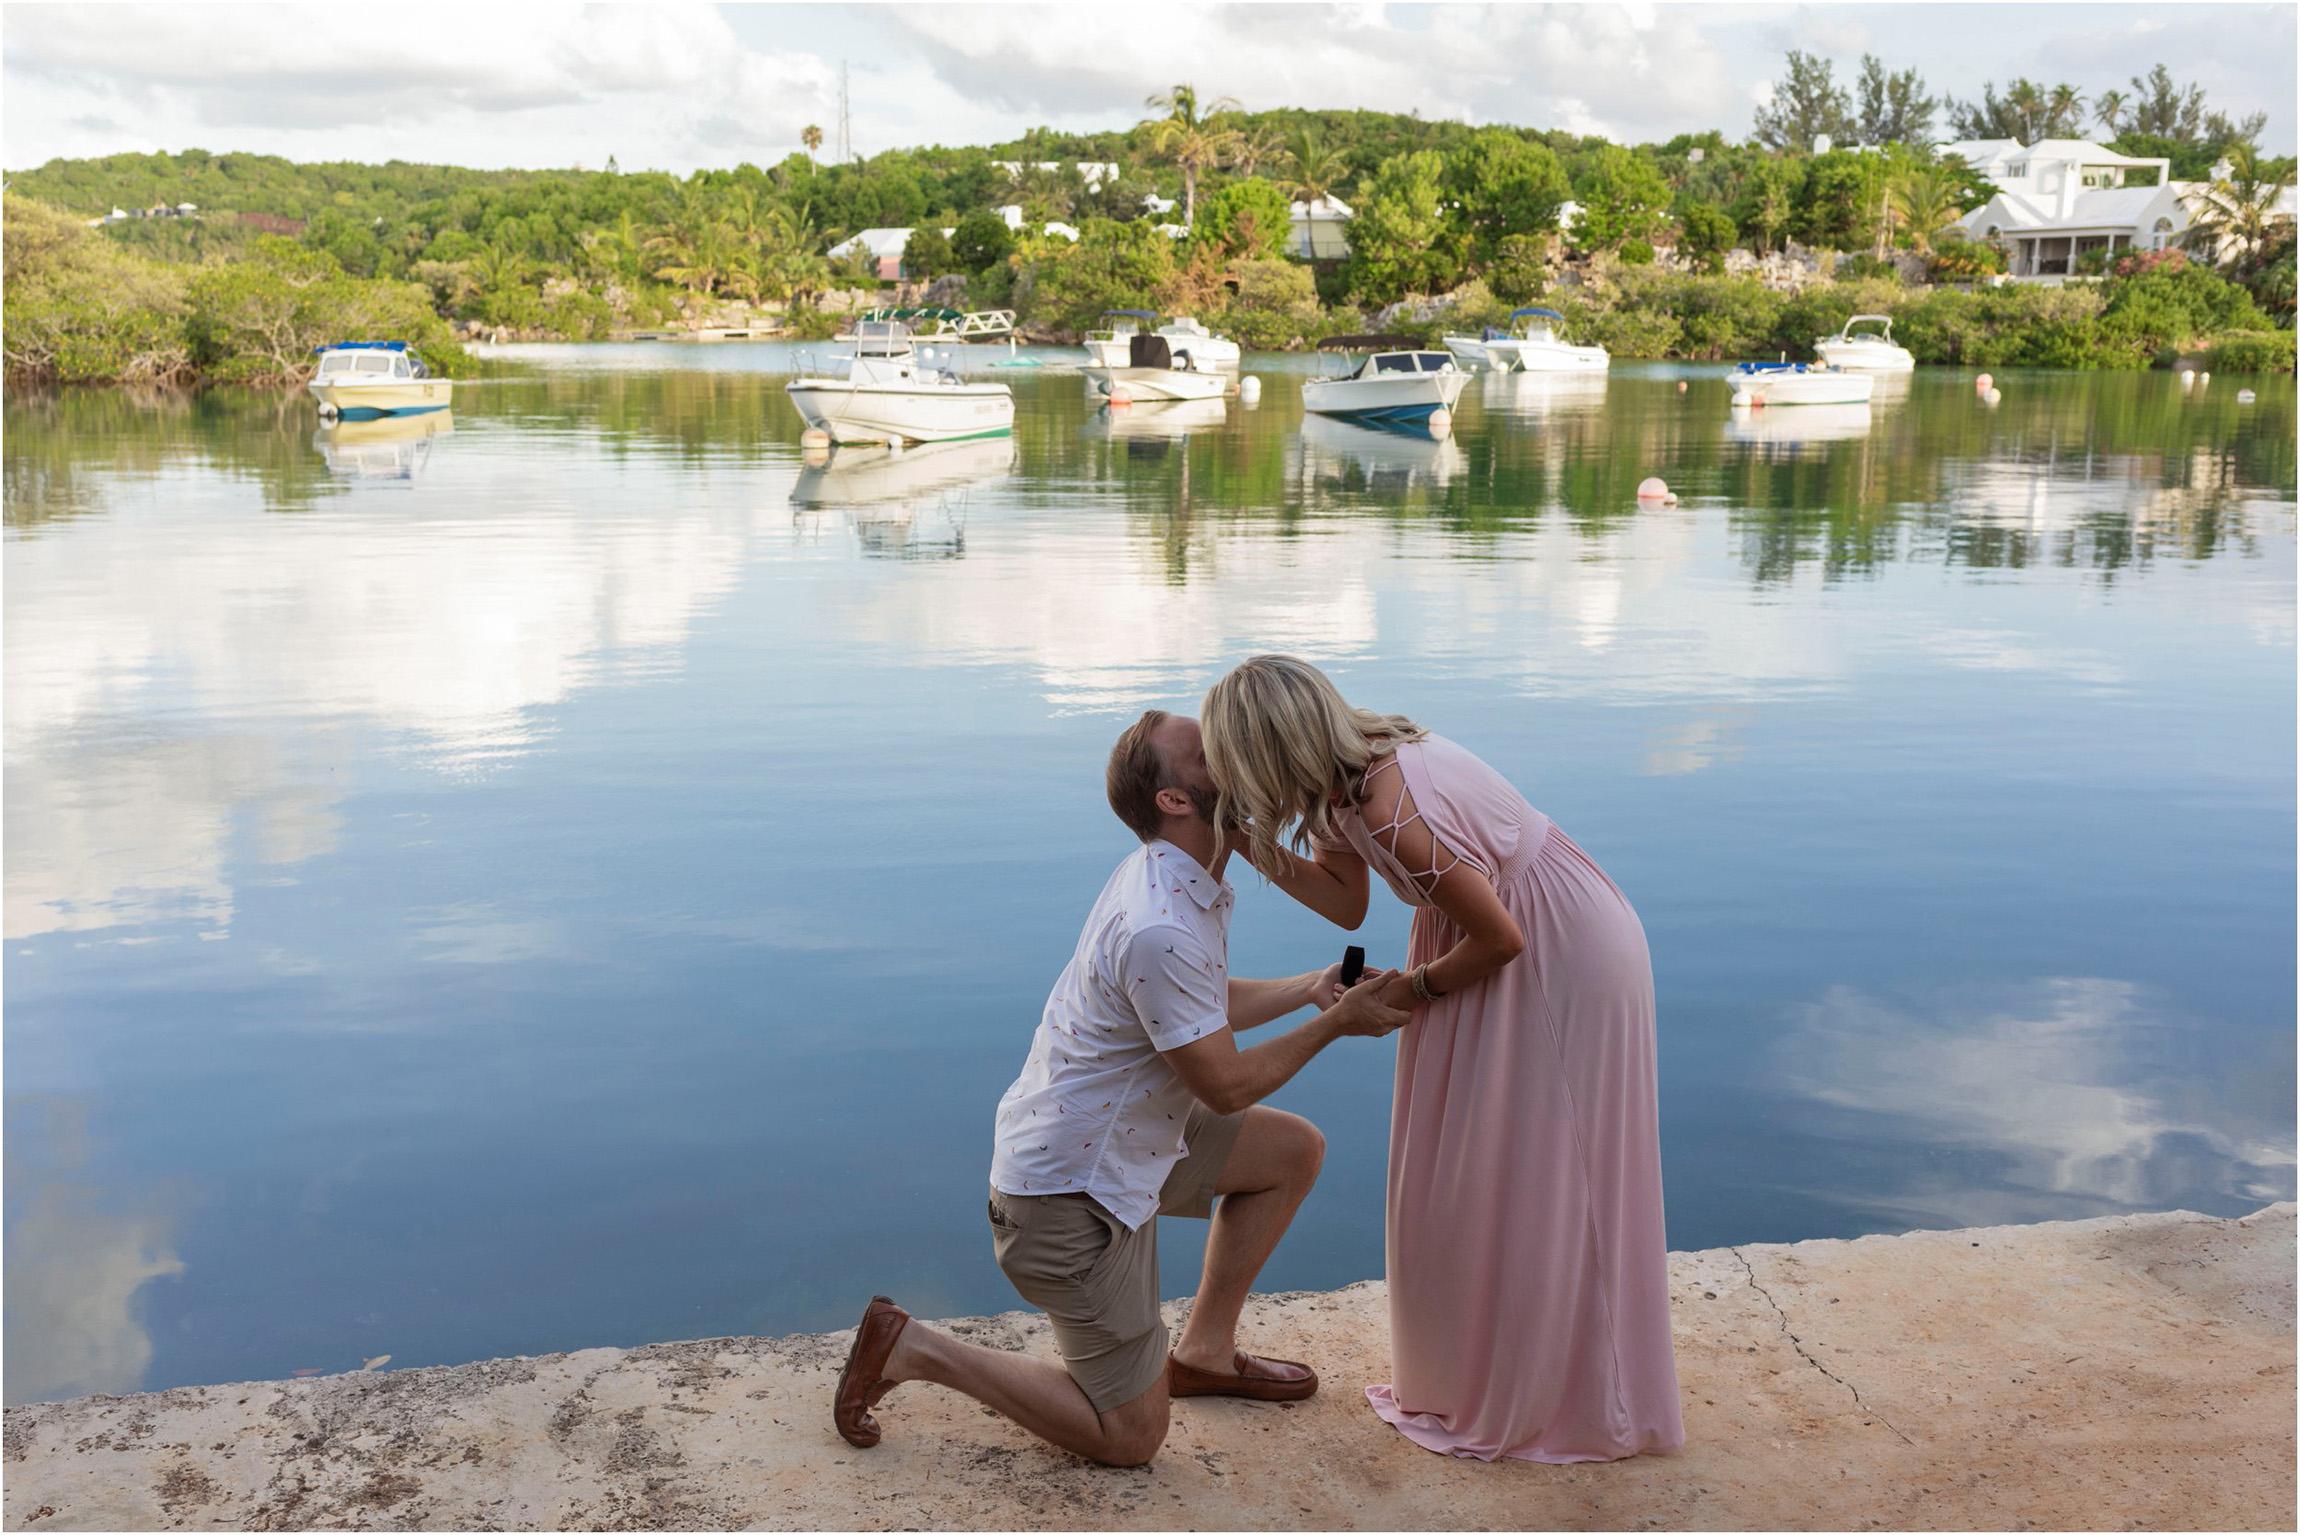 ©FianderFoto_Bermuda_Tom Moore's Jungle_Proposal Maternity Photographer_Erika_Andy_004.jpg